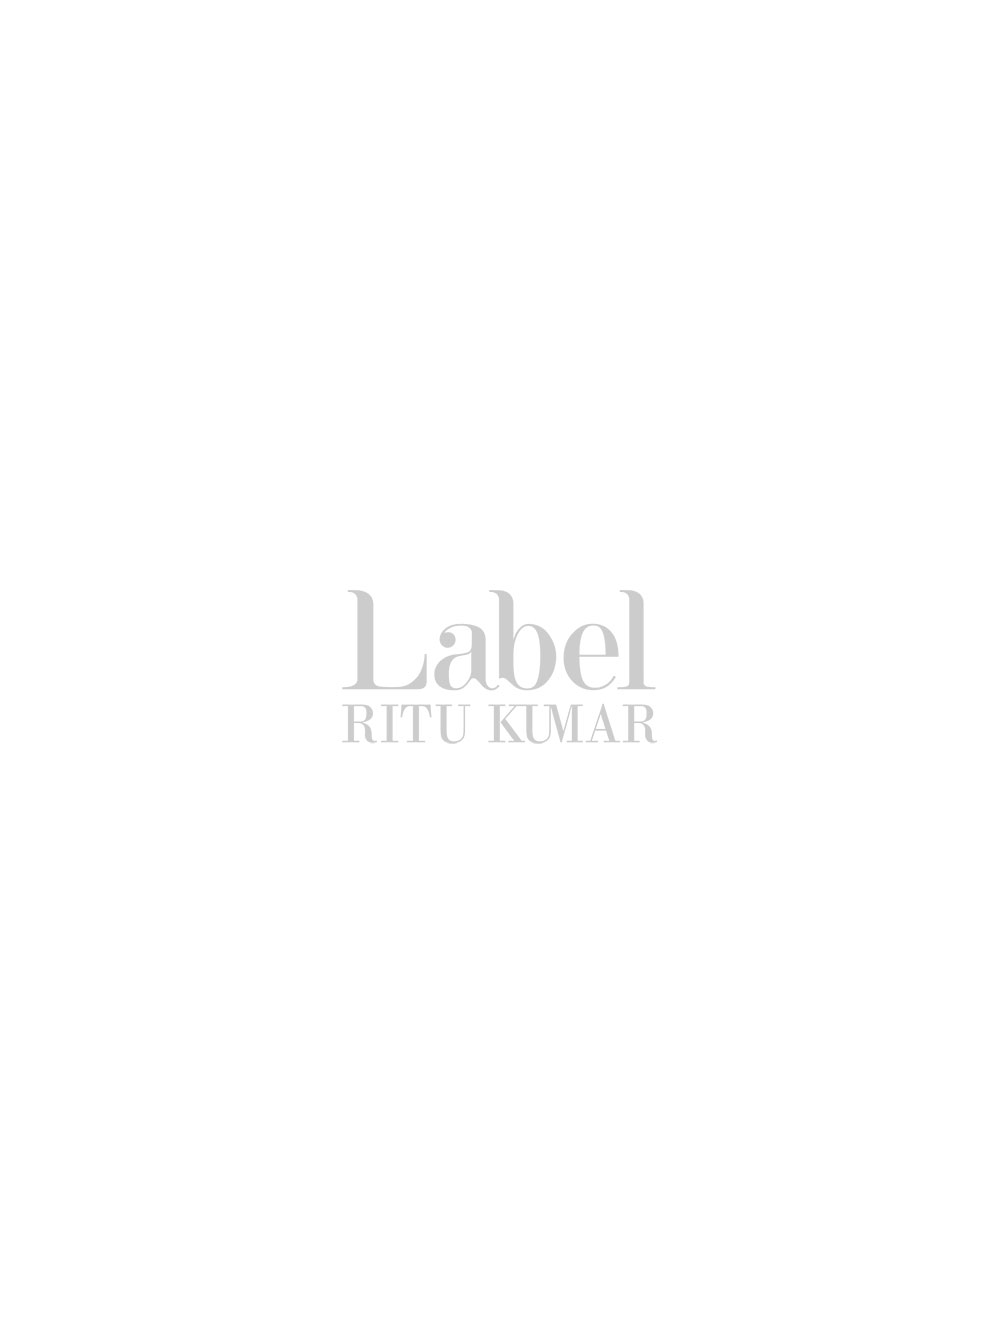 Designer Bottom Wear by Label Ritu Kumar